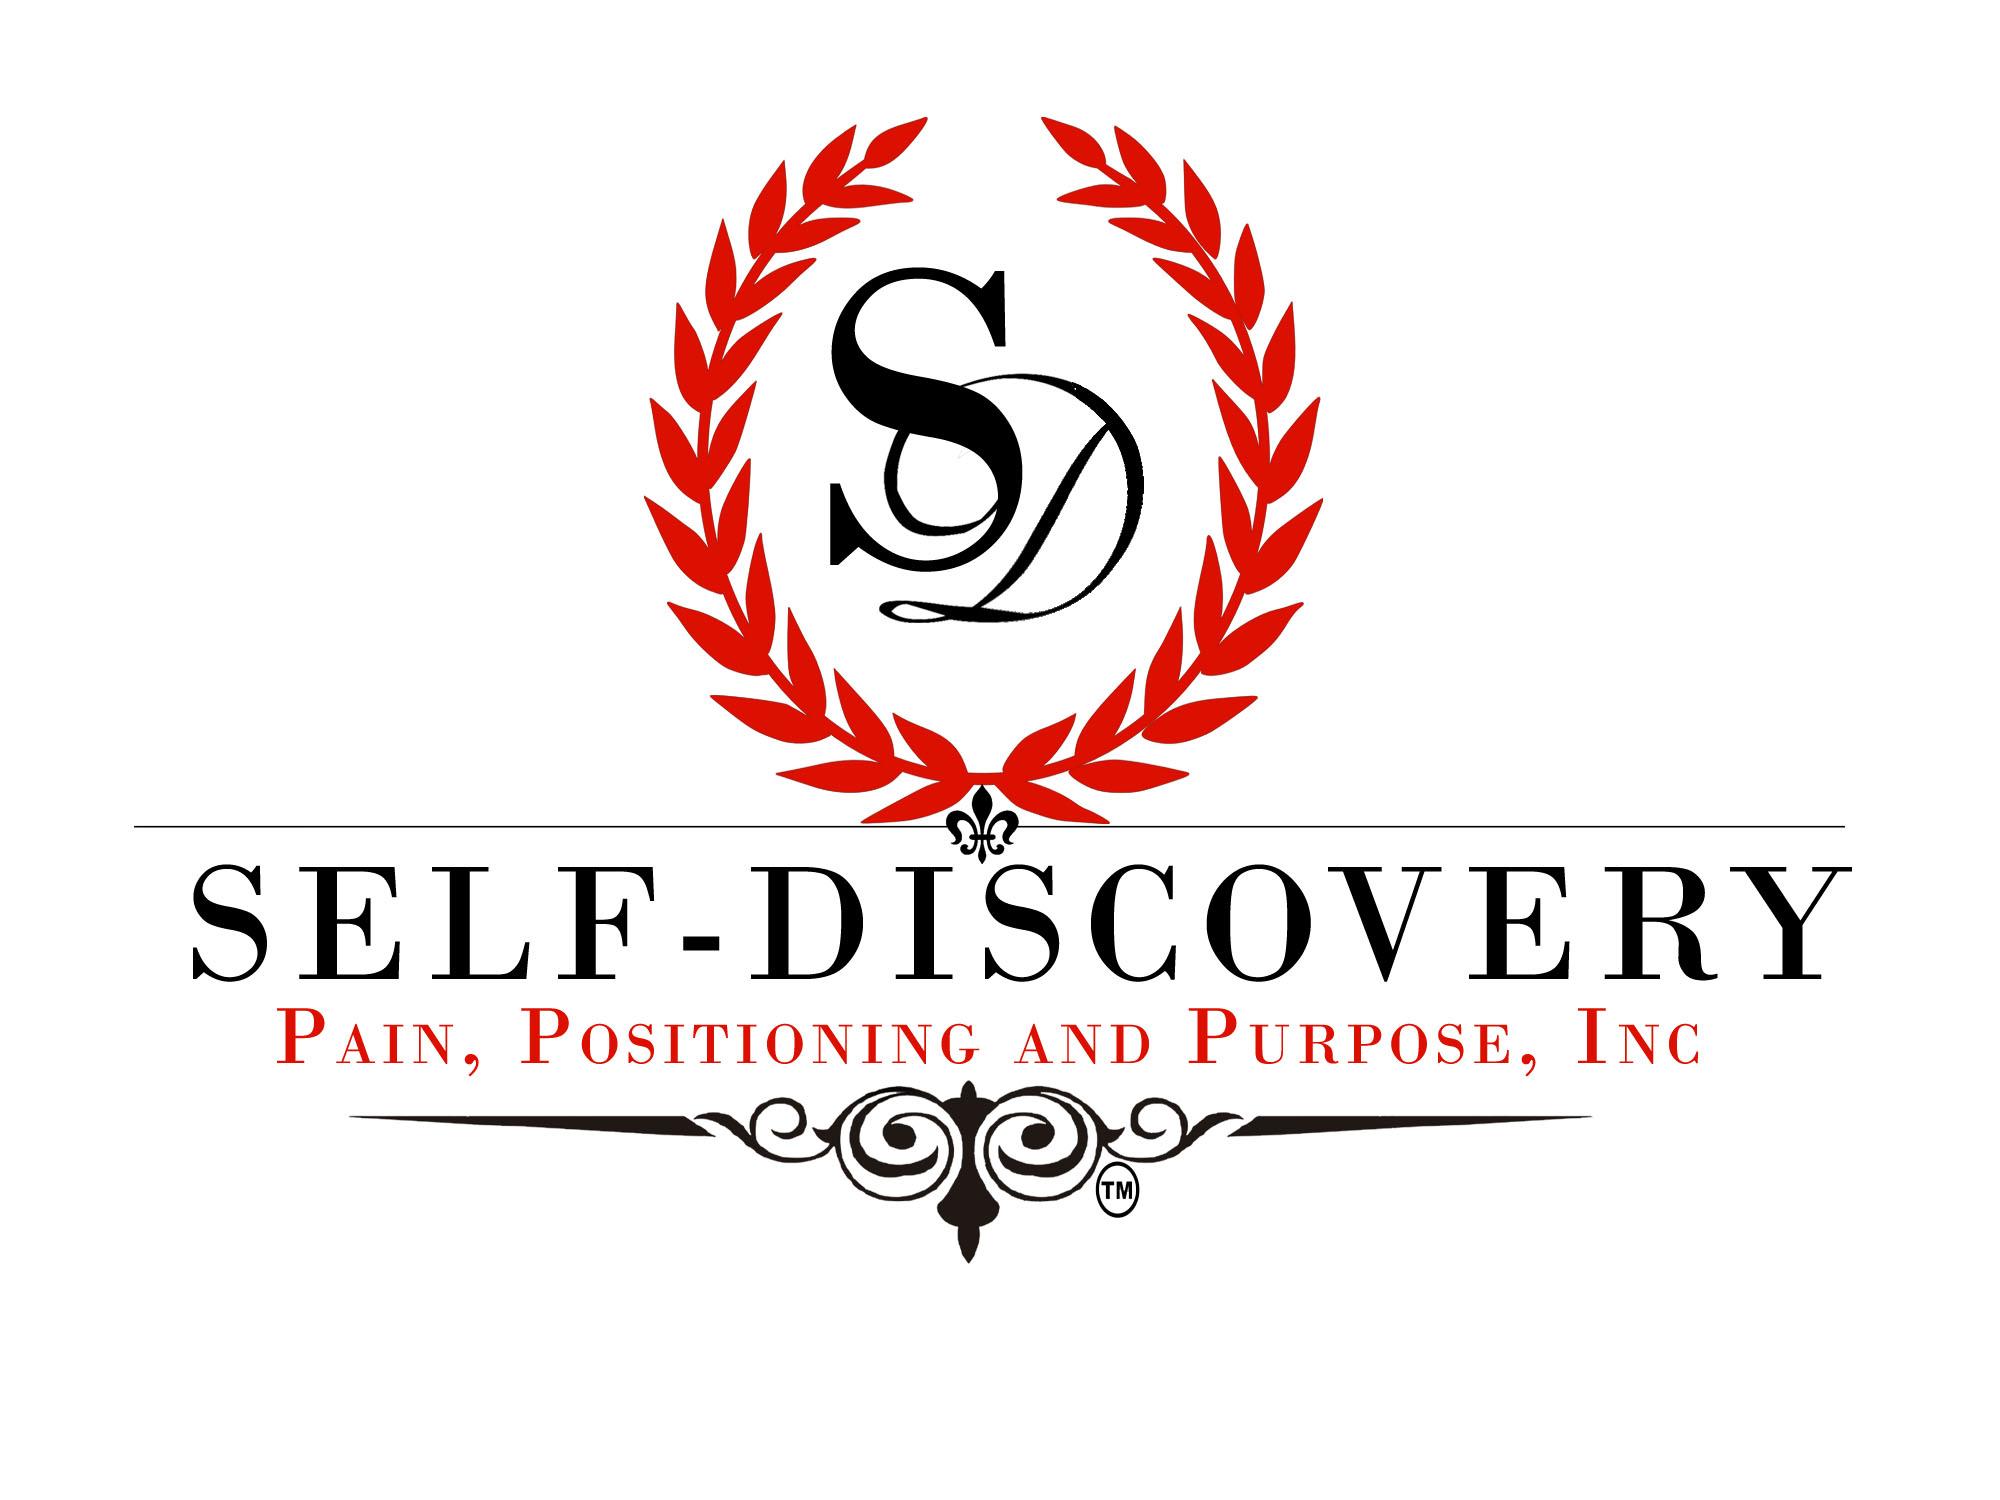 SelfDiscovery.jpg